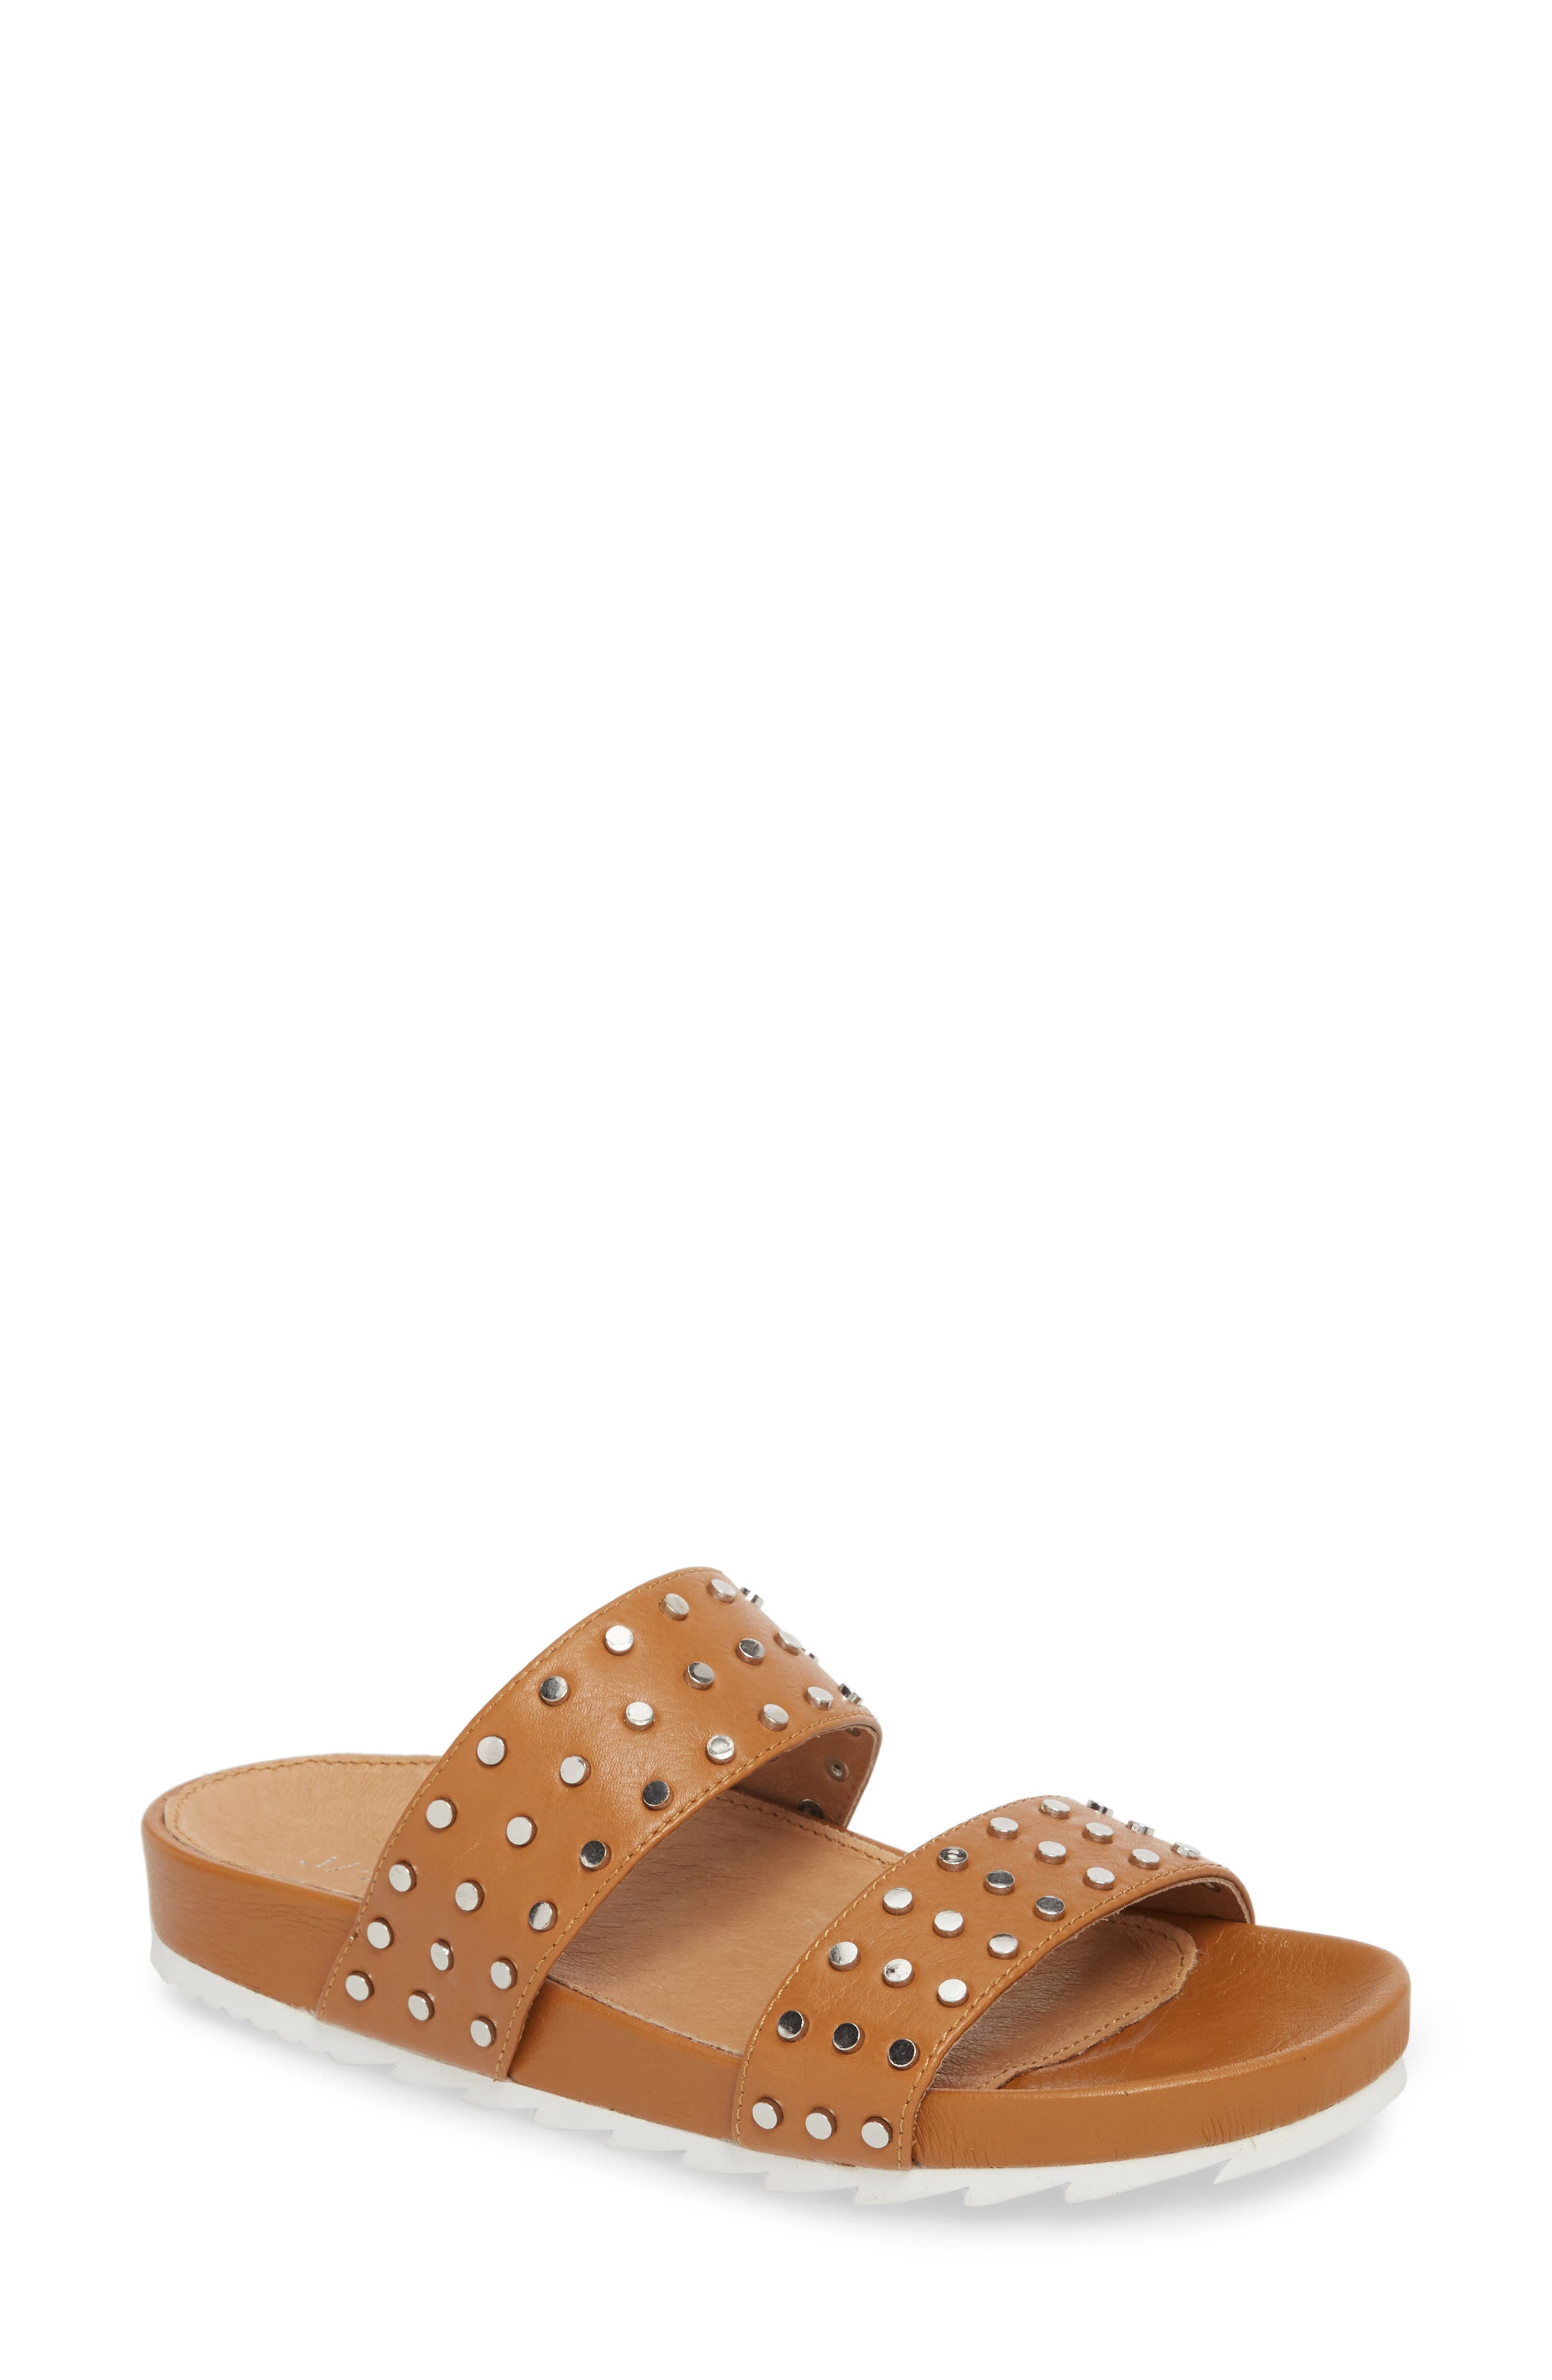 Erika Studded Slide Sandal,                             Main thumbnail 1, color,                             Tan Leather